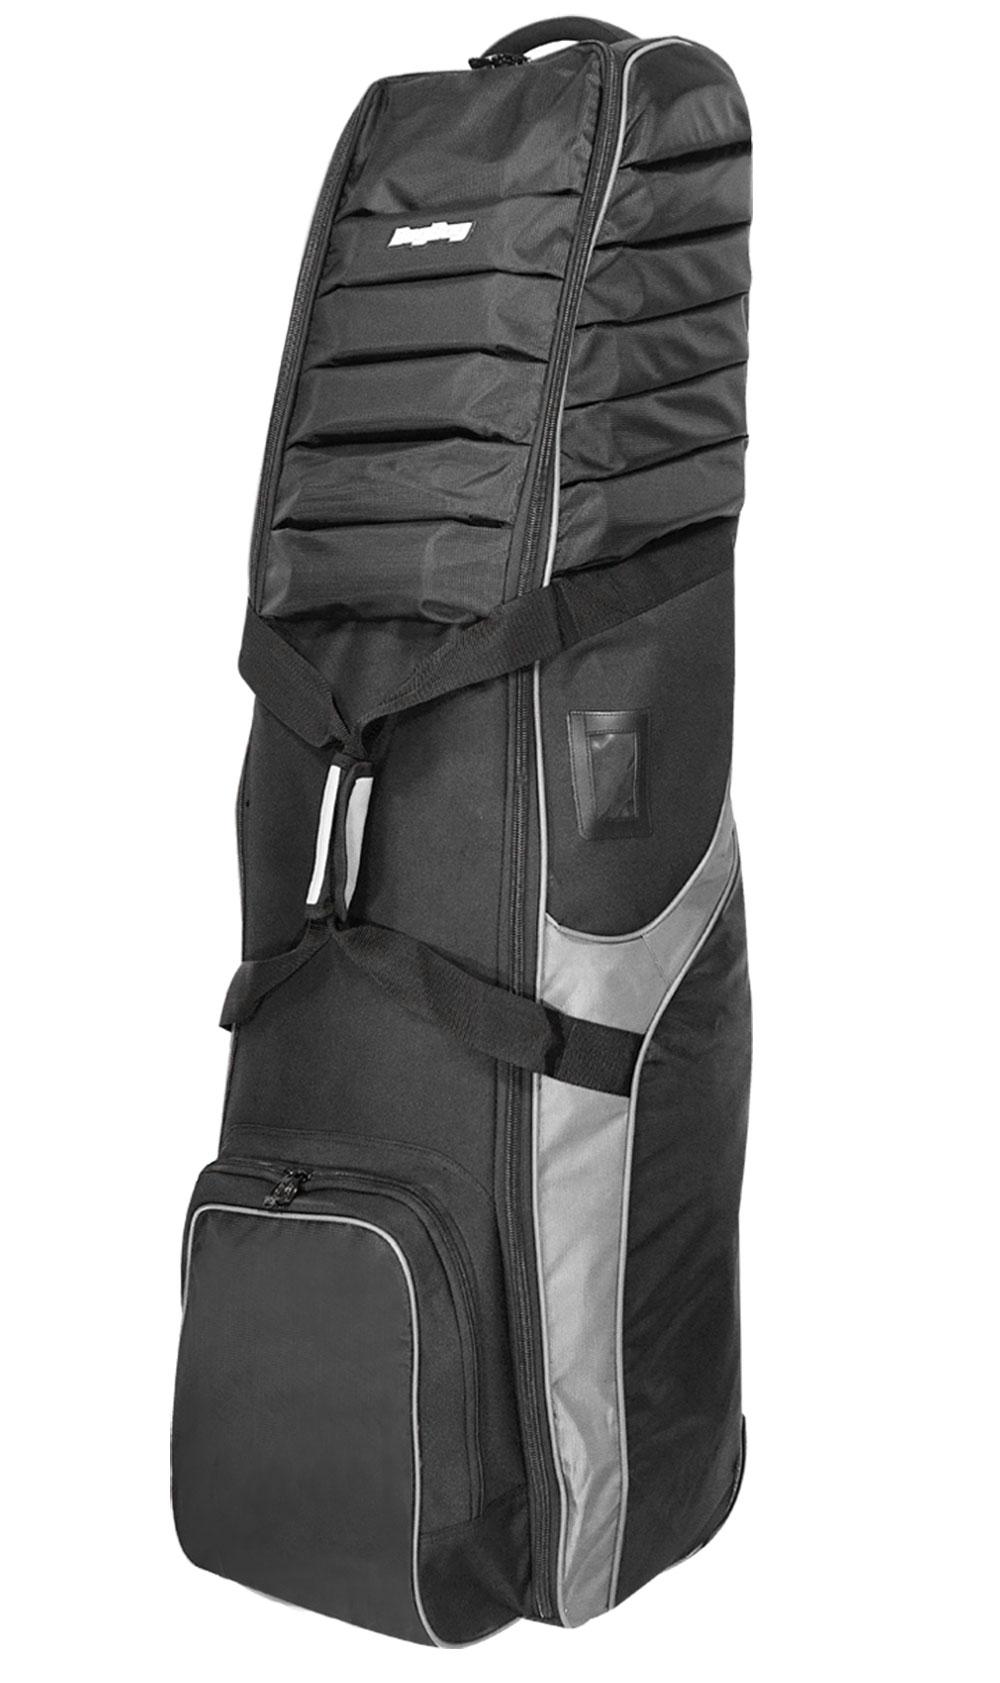 71a90bd0e317 Golf Travel Bags- Caravan 3.0 Wheeled Travel Cover | RockBottomGolf.com